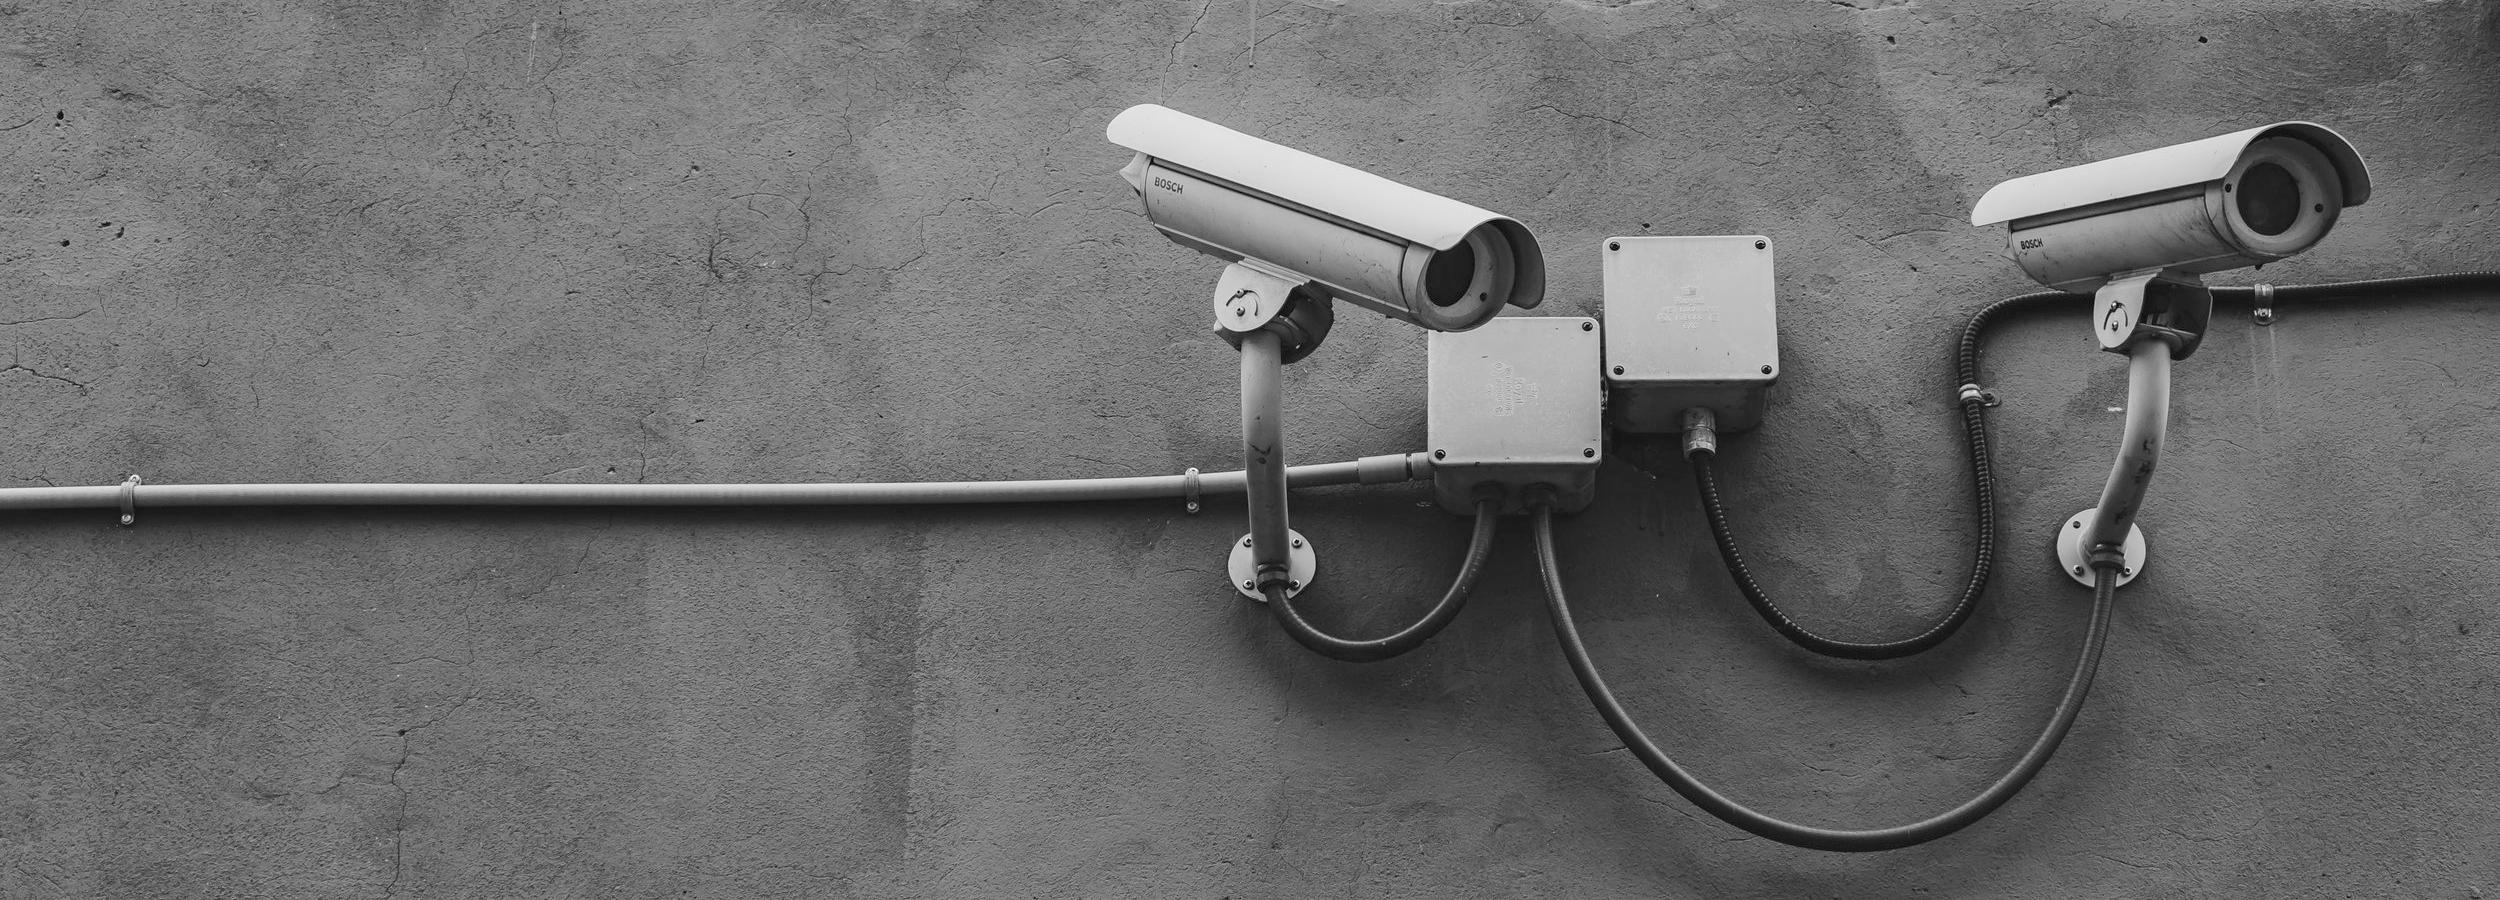 Security Needs -